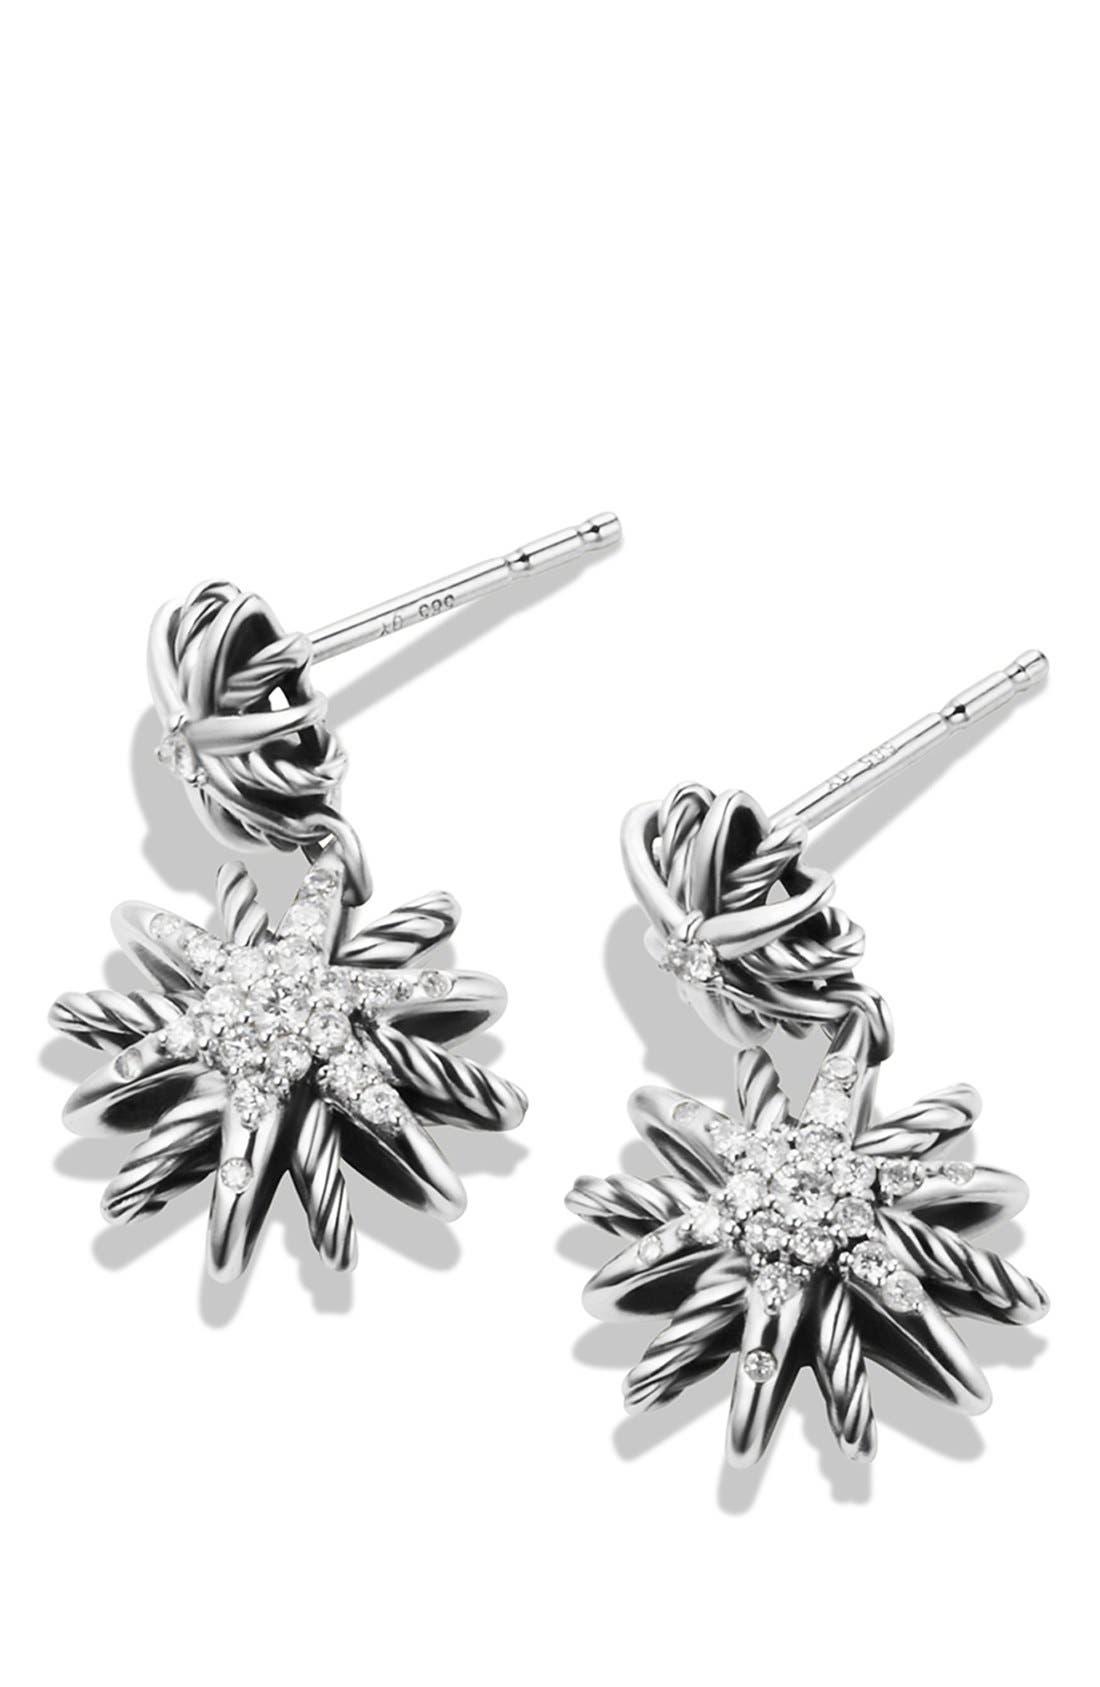 'Starburst' Double-Drop Earrings with Diamonds,                             Alternate thumbnail 3, color,                             DIAMOND